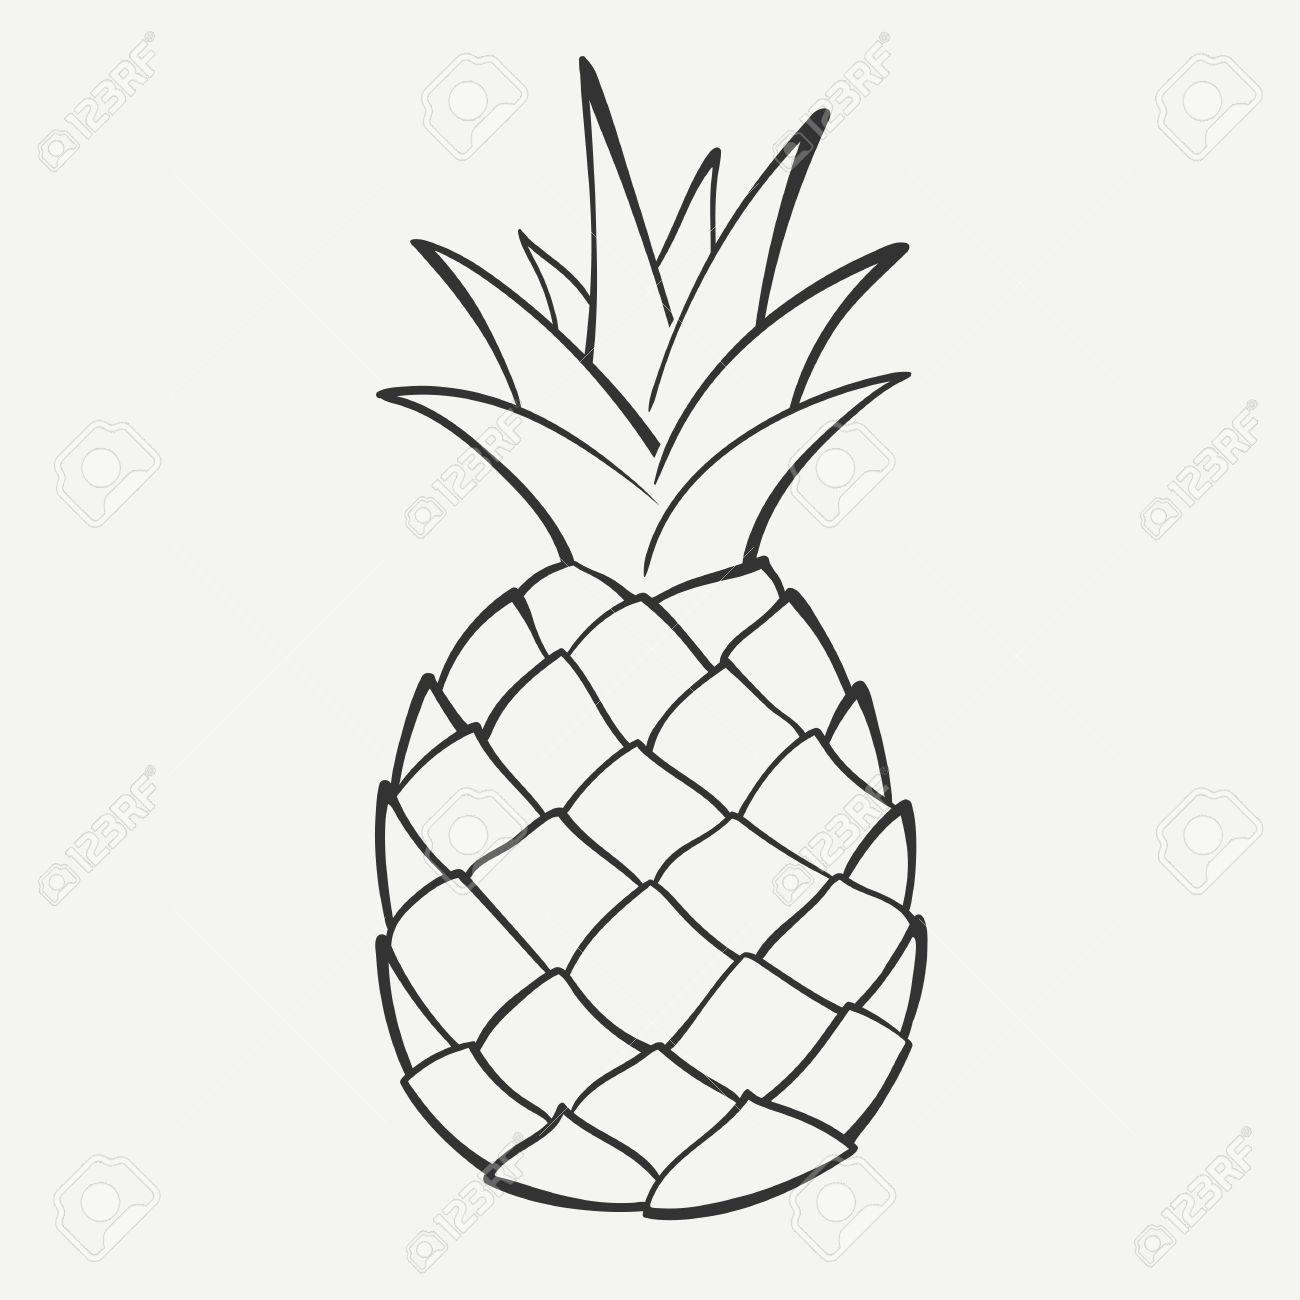 Drawn black x free. Pineapple clipart grey